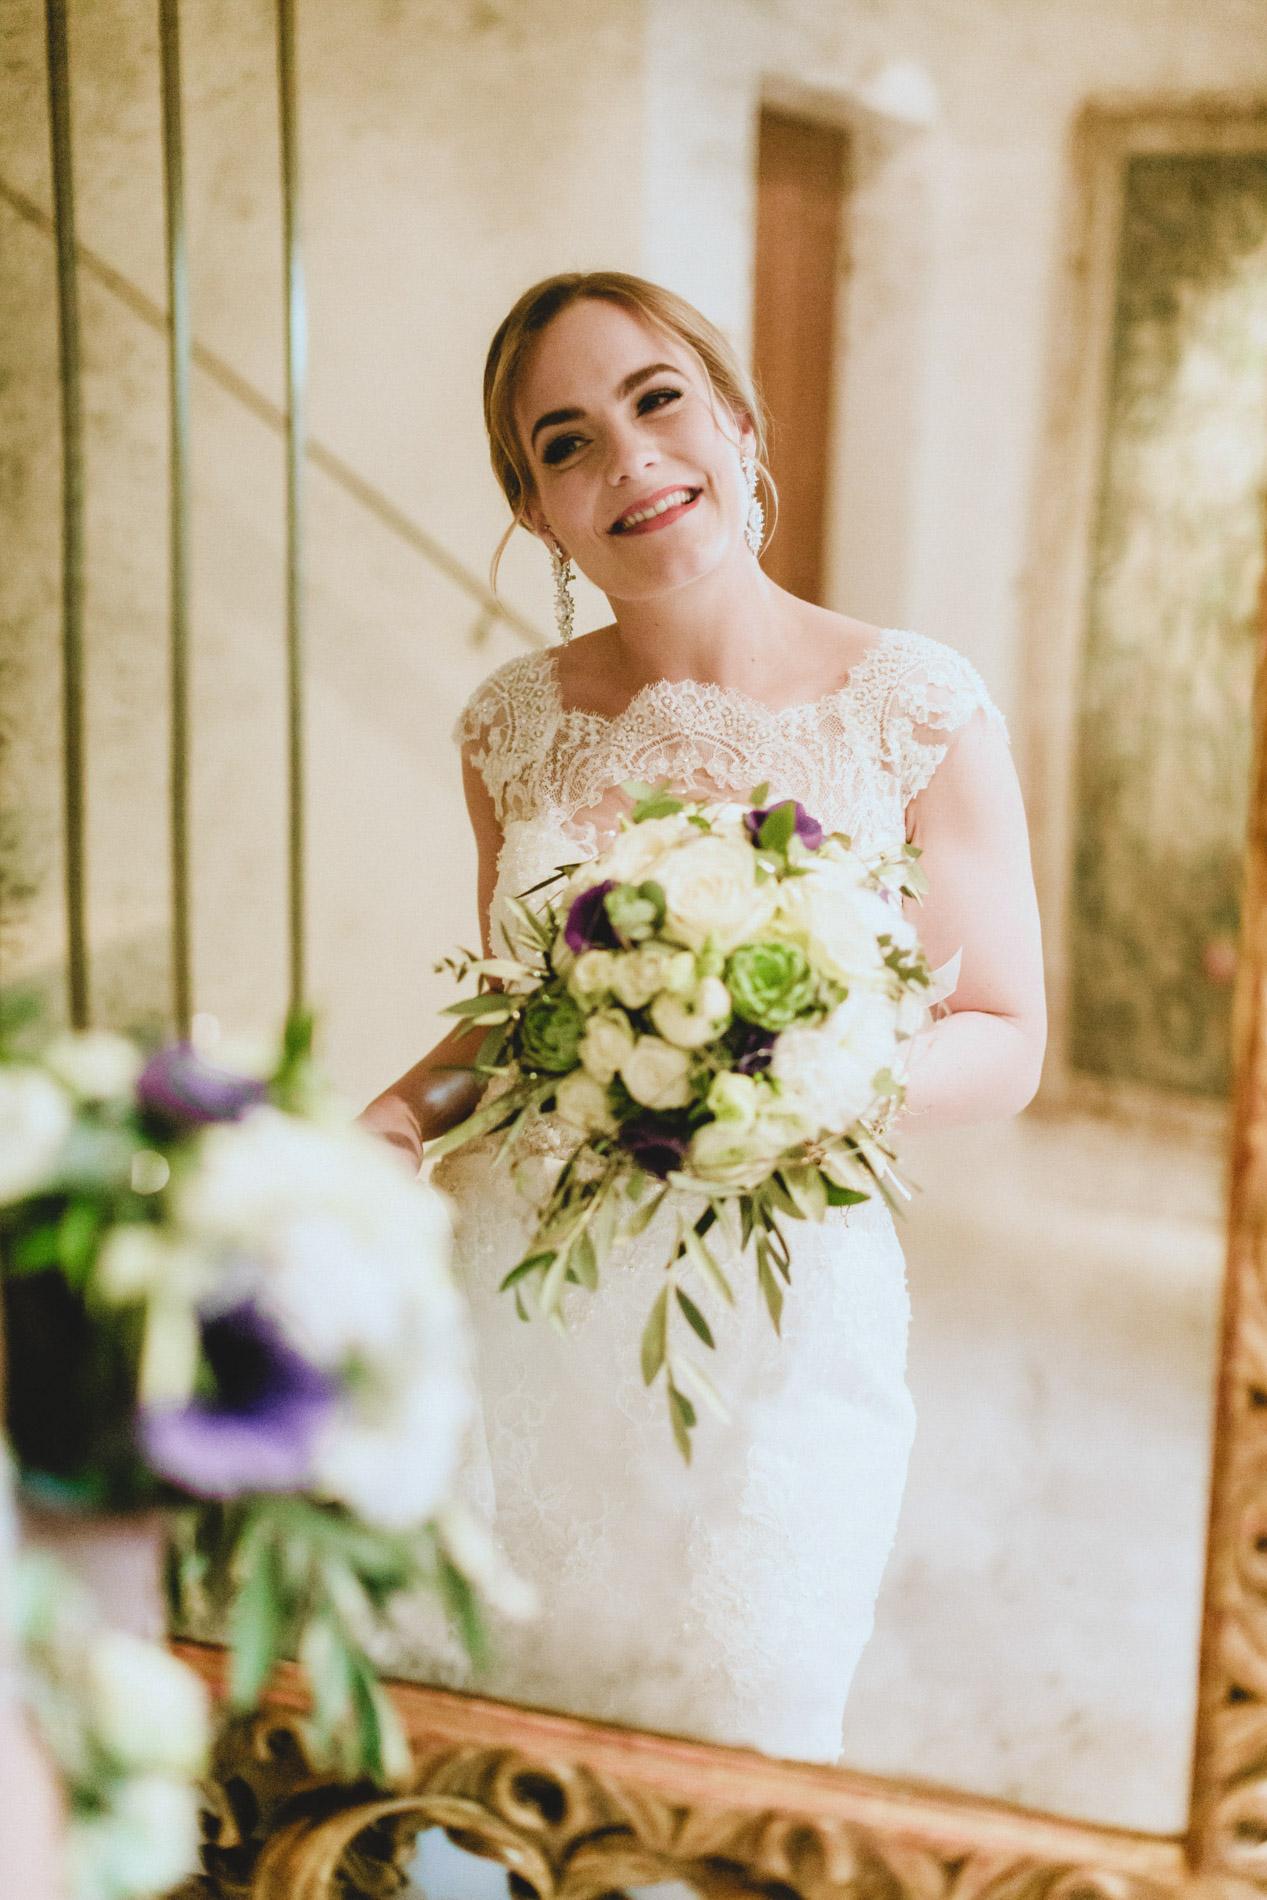 hochzeitsfotografie-schweiz_wedding-photographer-switzerland-europe_Bendik-Photography-090